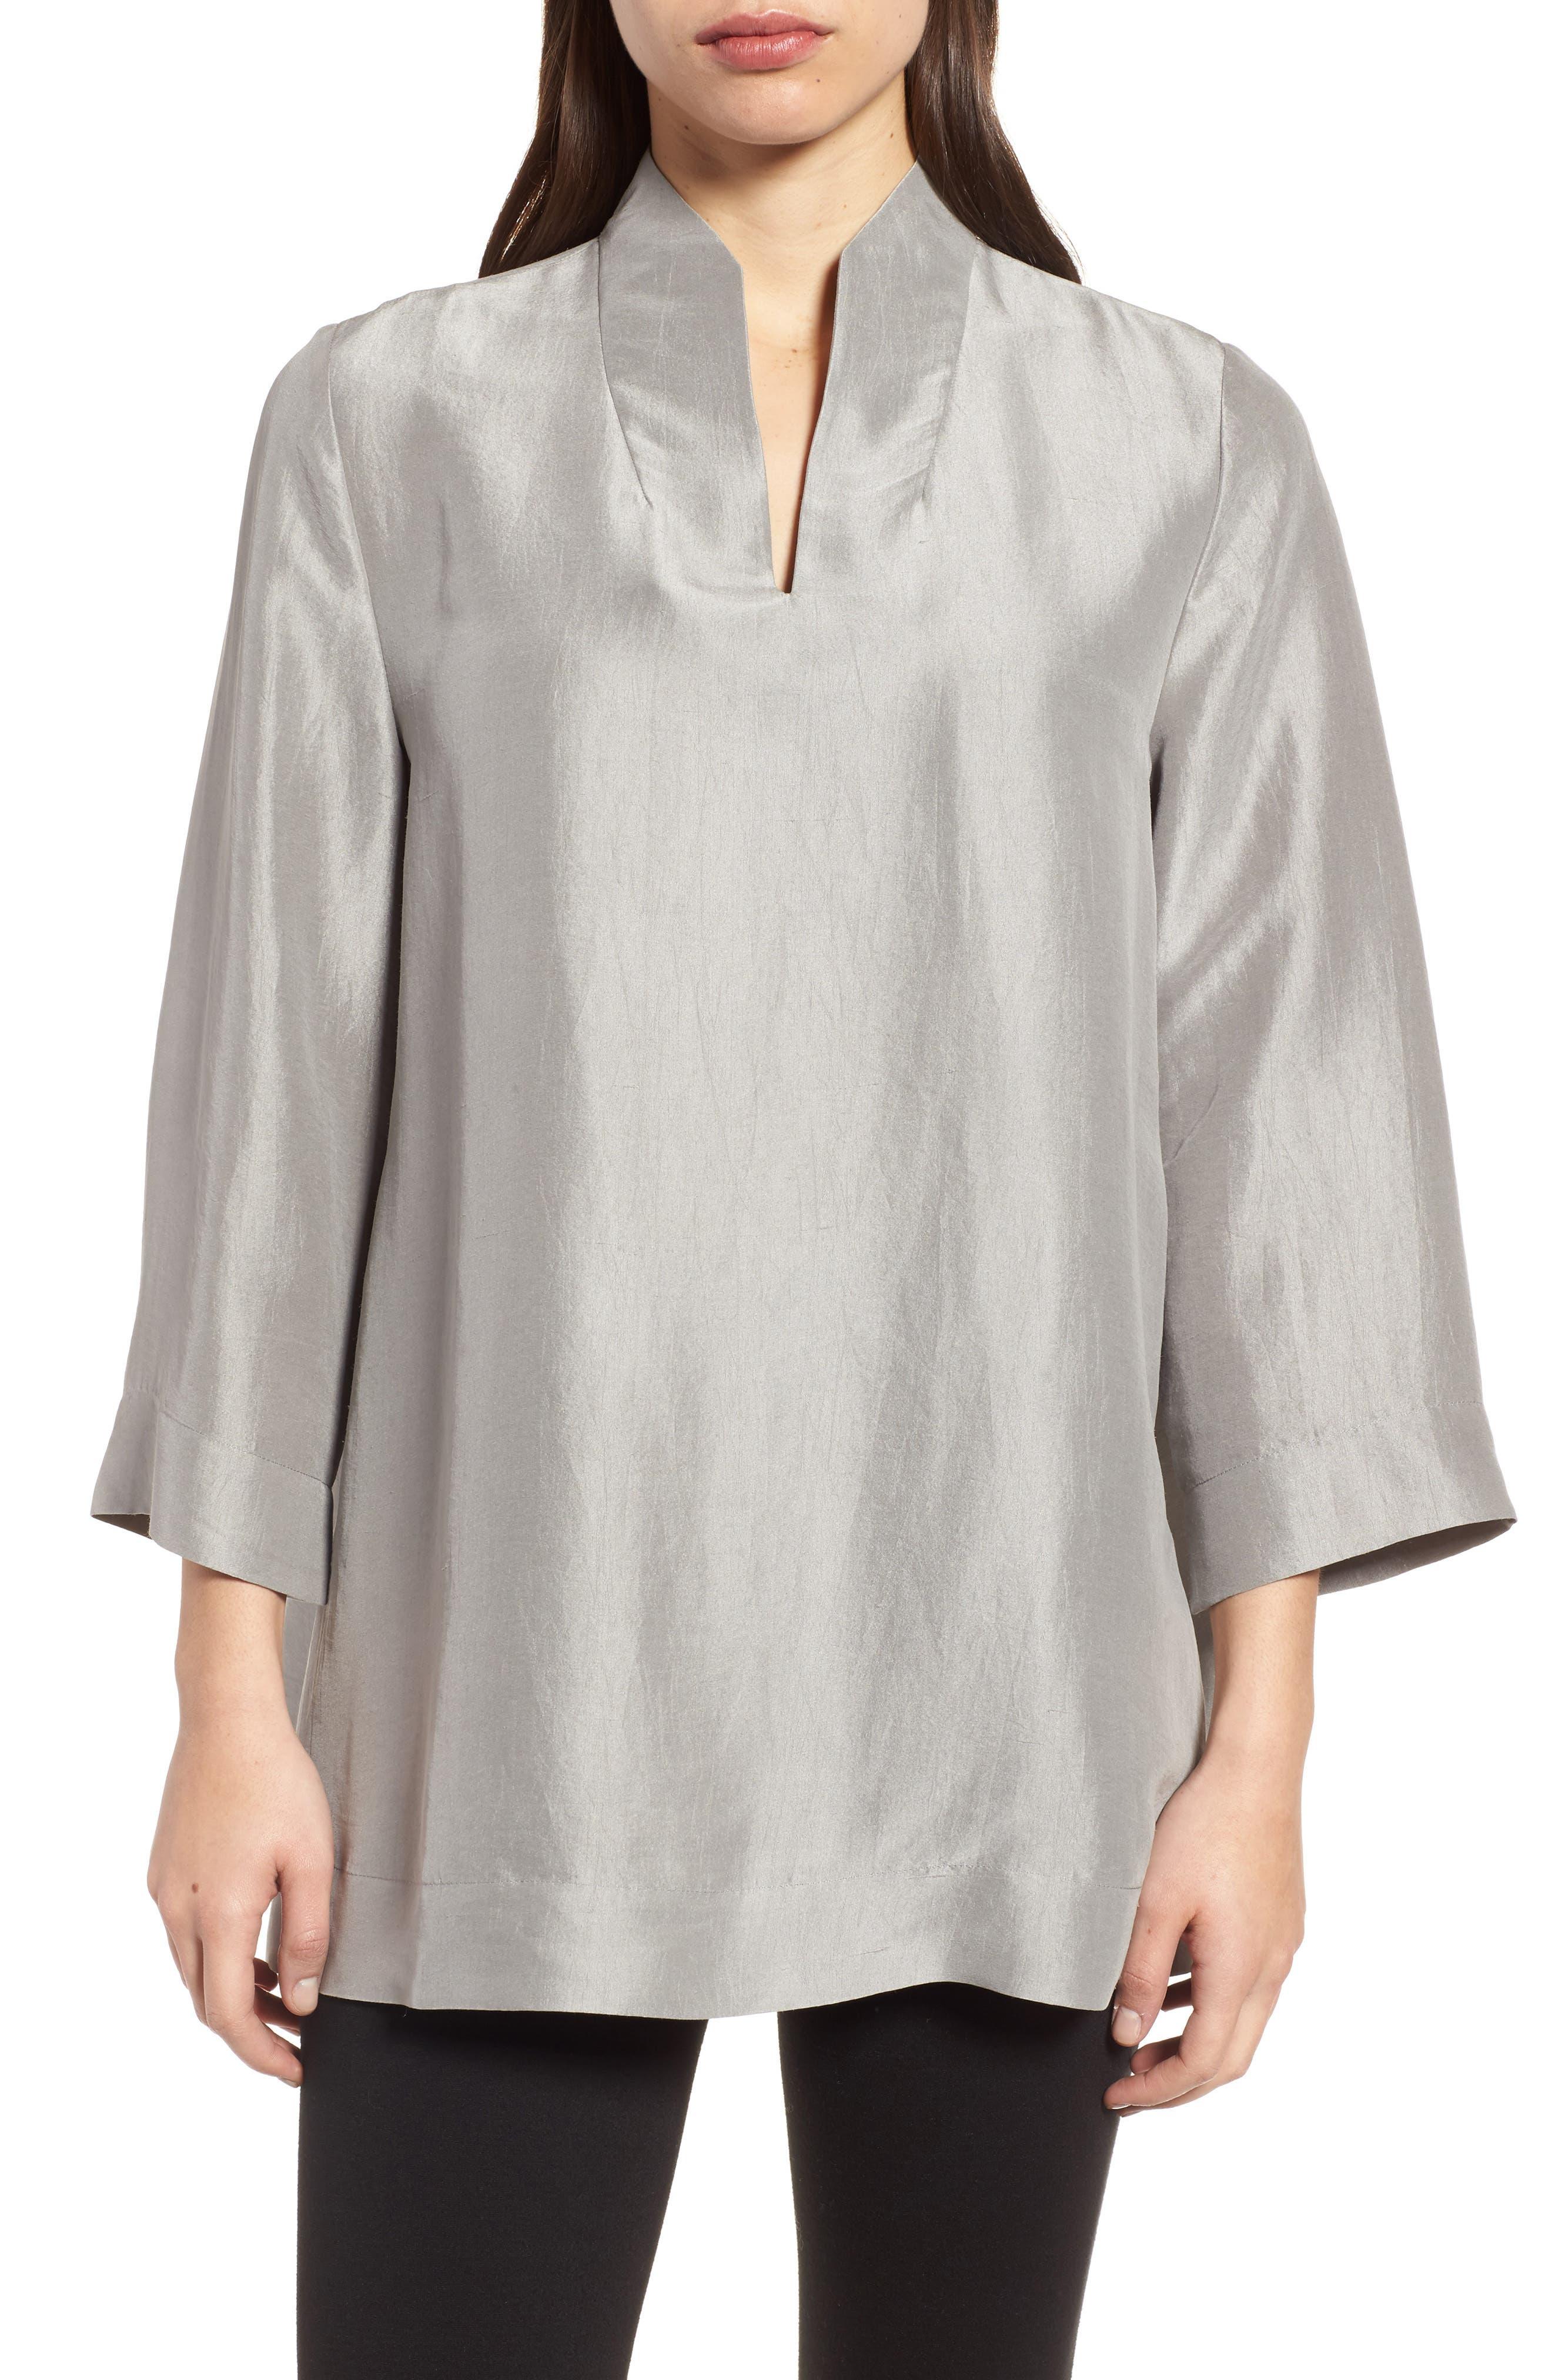 Eileen Fisher Silk Top (Regular & Petite)